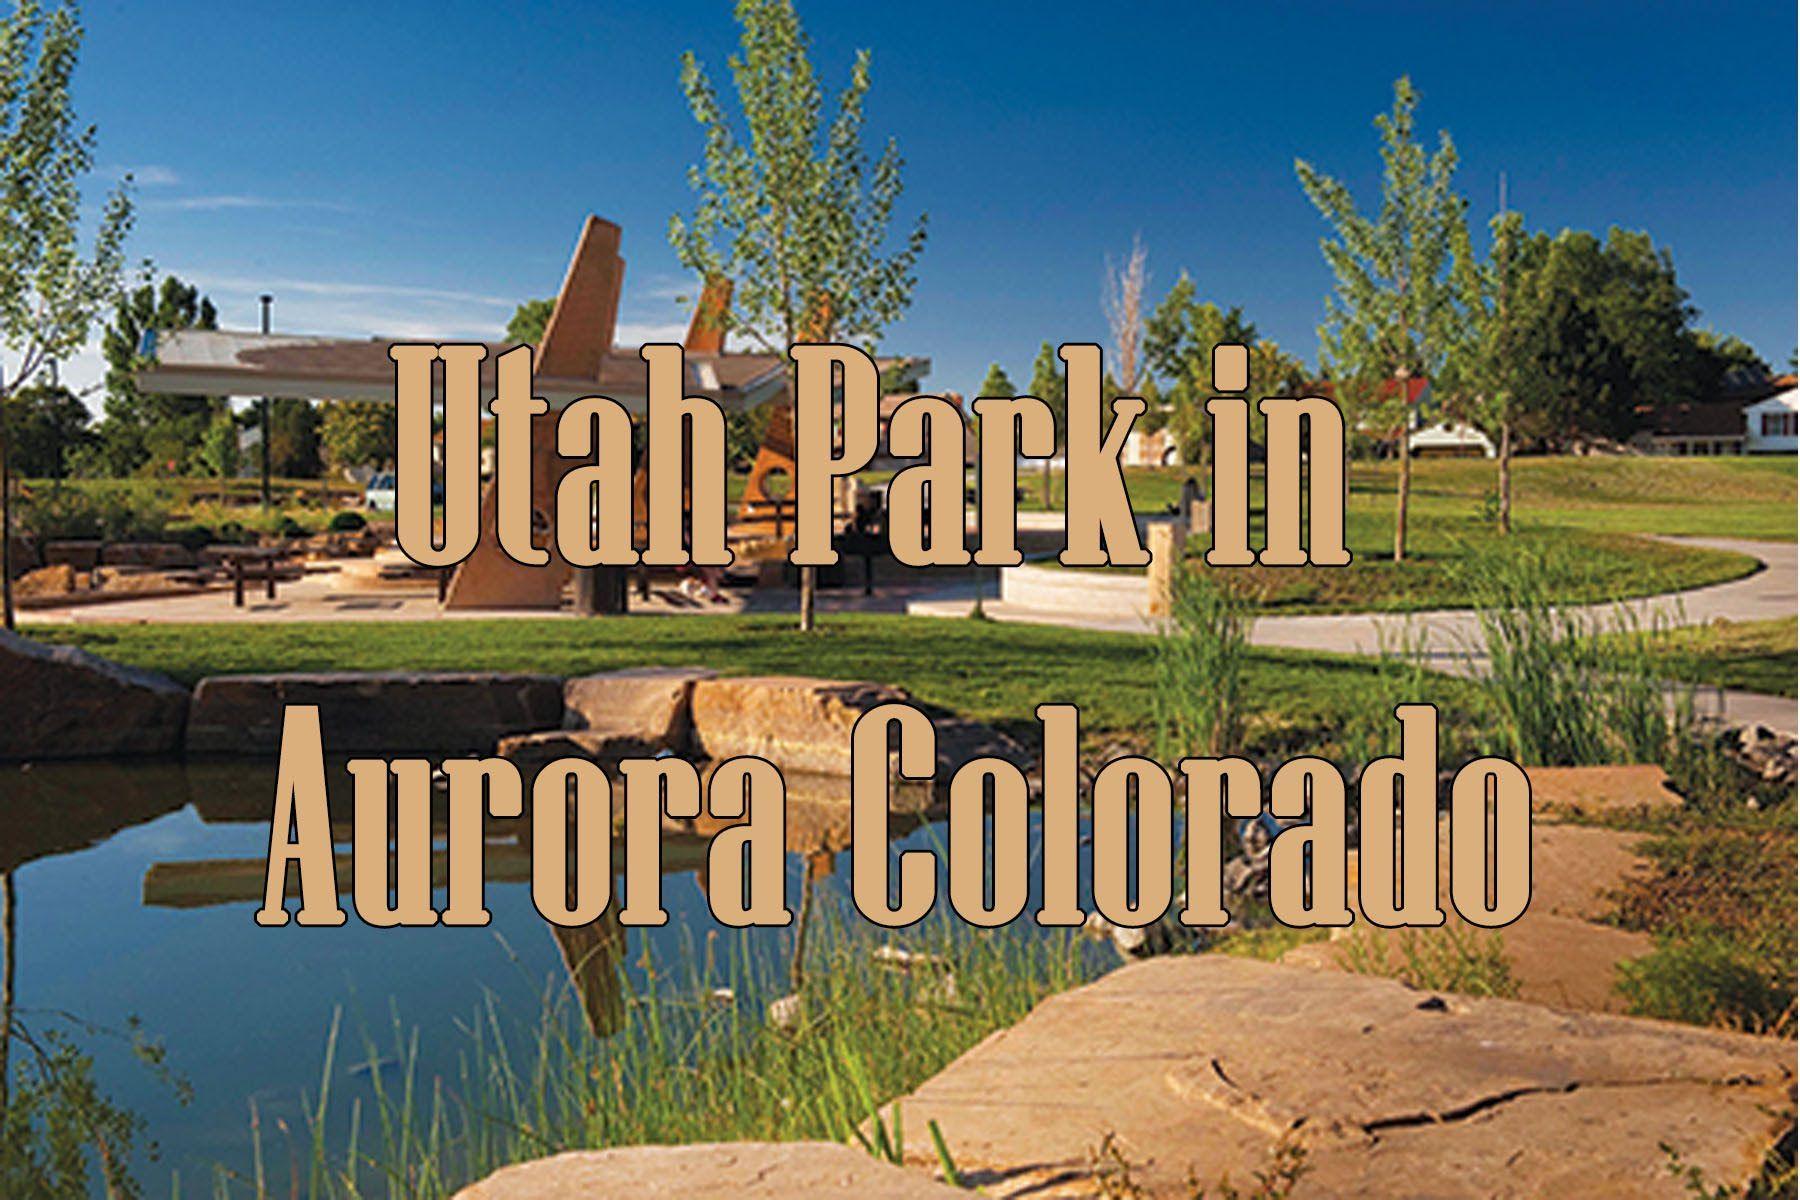 Utah Park in Aurora Colorado Utah park, Colorado